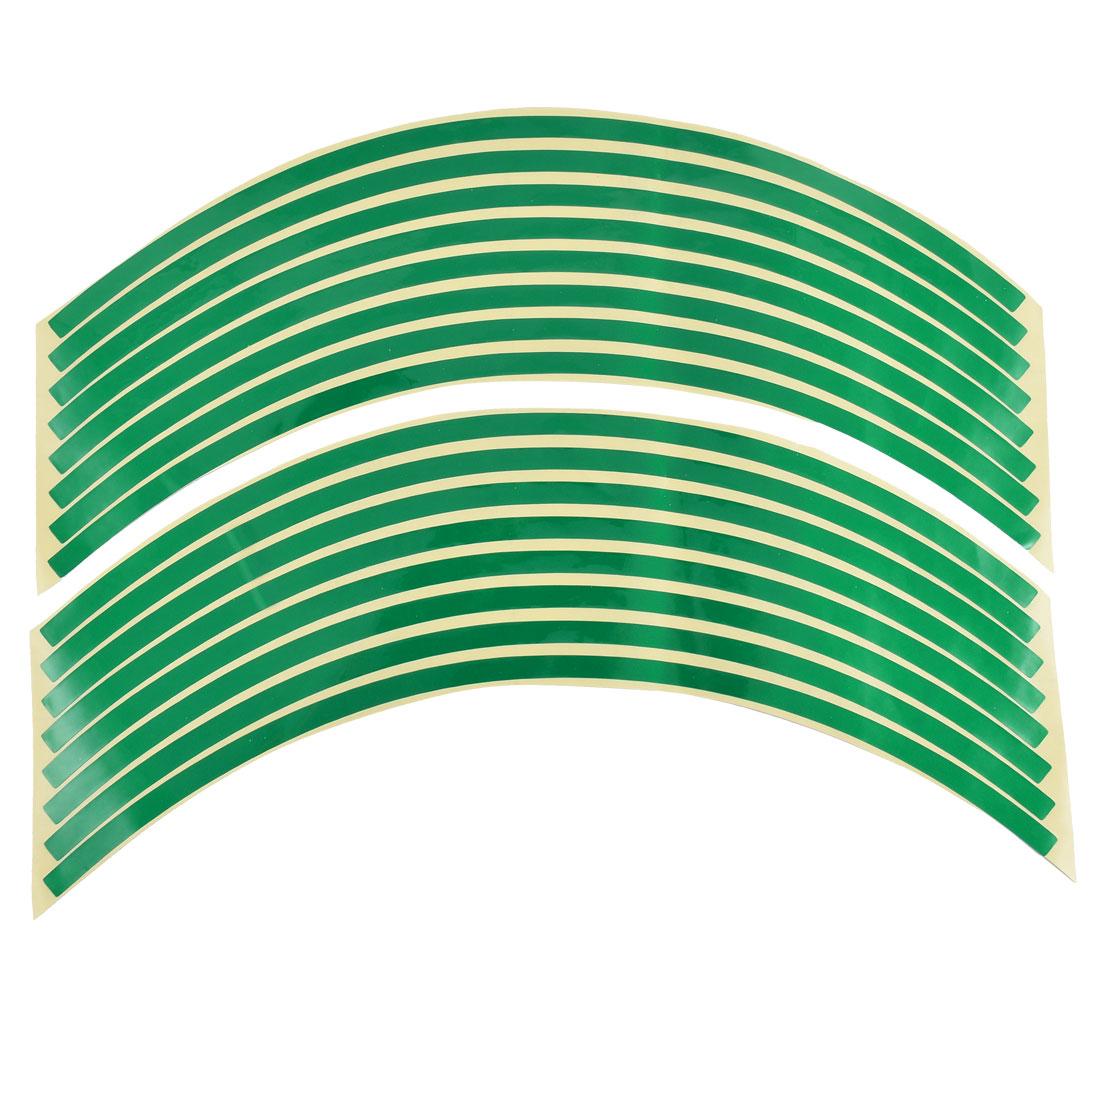 "Car Motorcycle Cycling Bike Bicycle Wheel Stripe Decal Trim Sticker Green 18"" Length 2 Pcs"